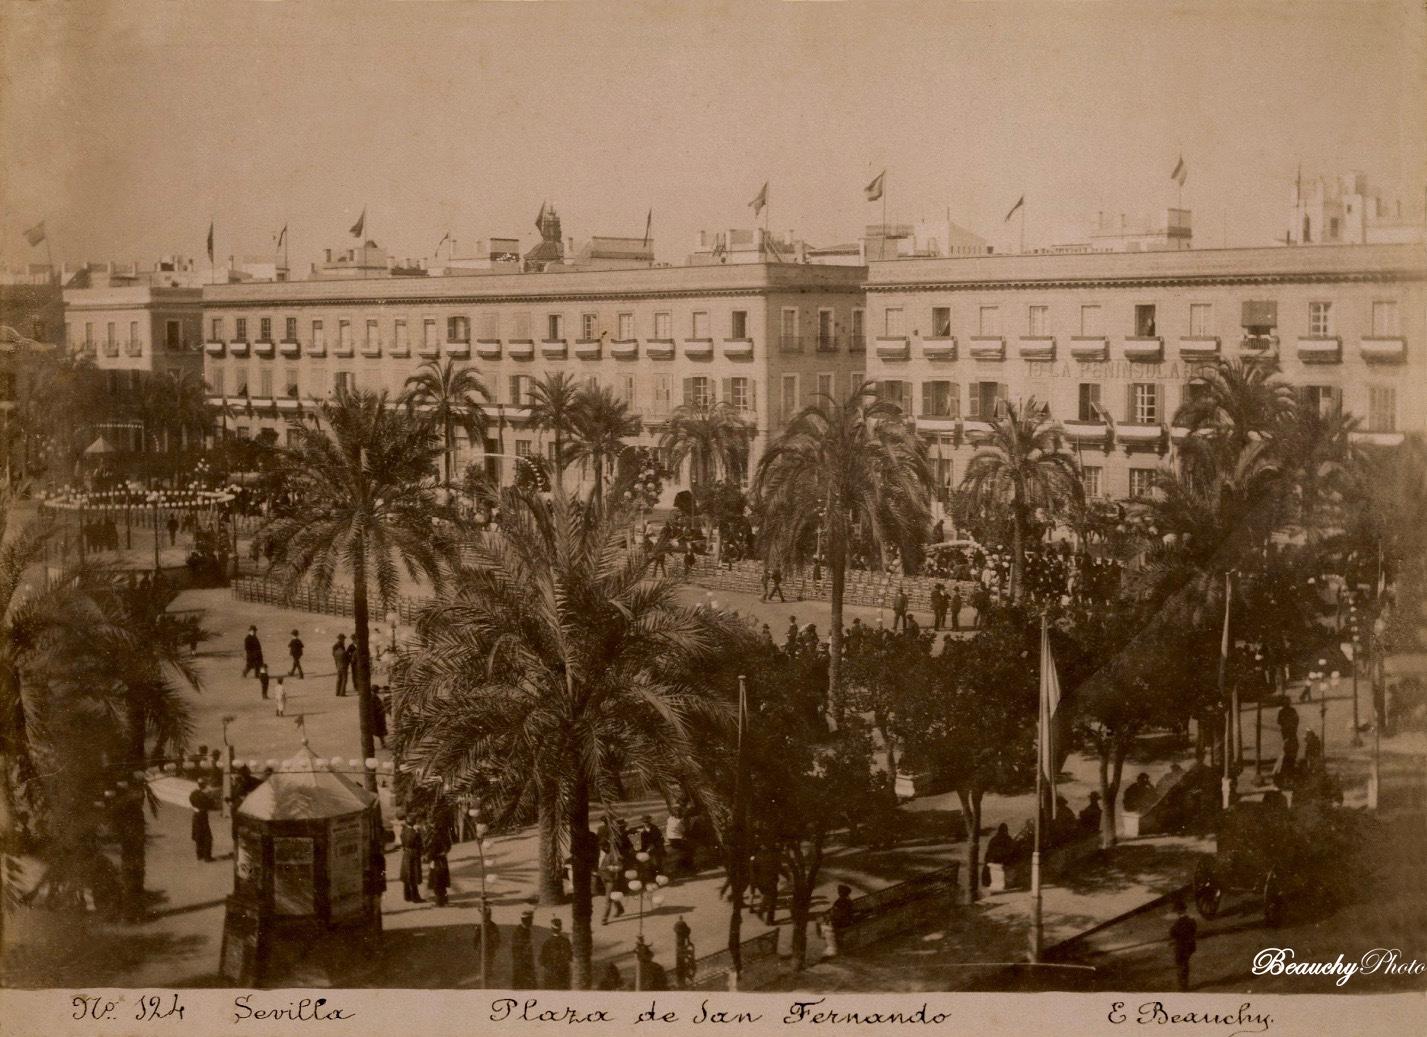 Beauchyphoto_Plaza_de_San_Fernando_3_Sevilla_Emilio_Beauchy_Cano_fotografias_antiguas_postales_vistas_y_monumentos